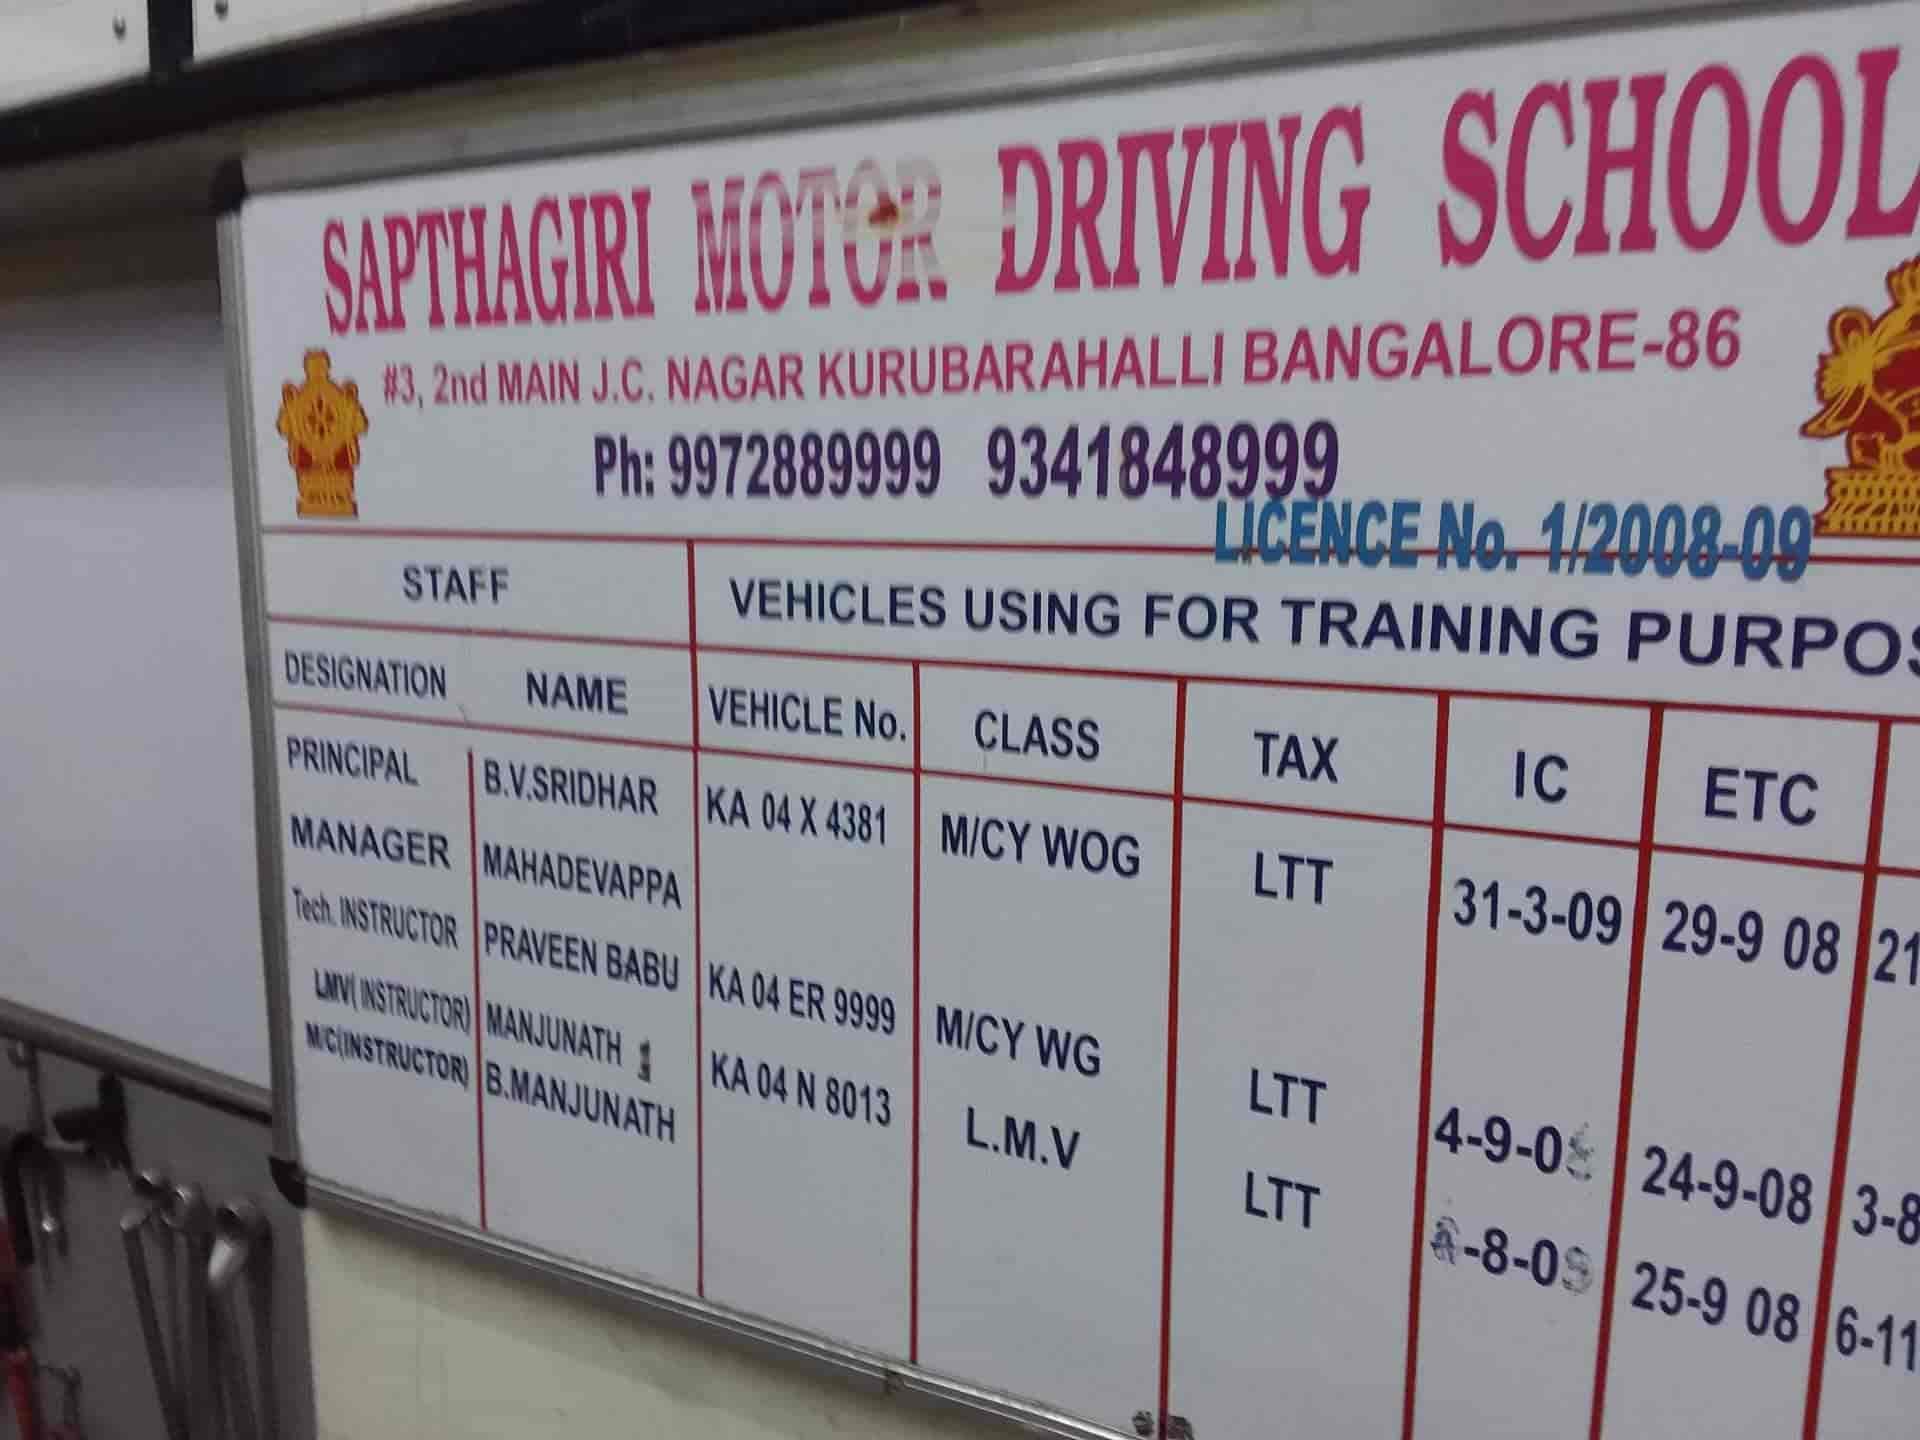 Sapthagiri Motor Driving School Mahalakshmipuram Layout Piping Course In Delhi Training Schools Bangalore Justdial